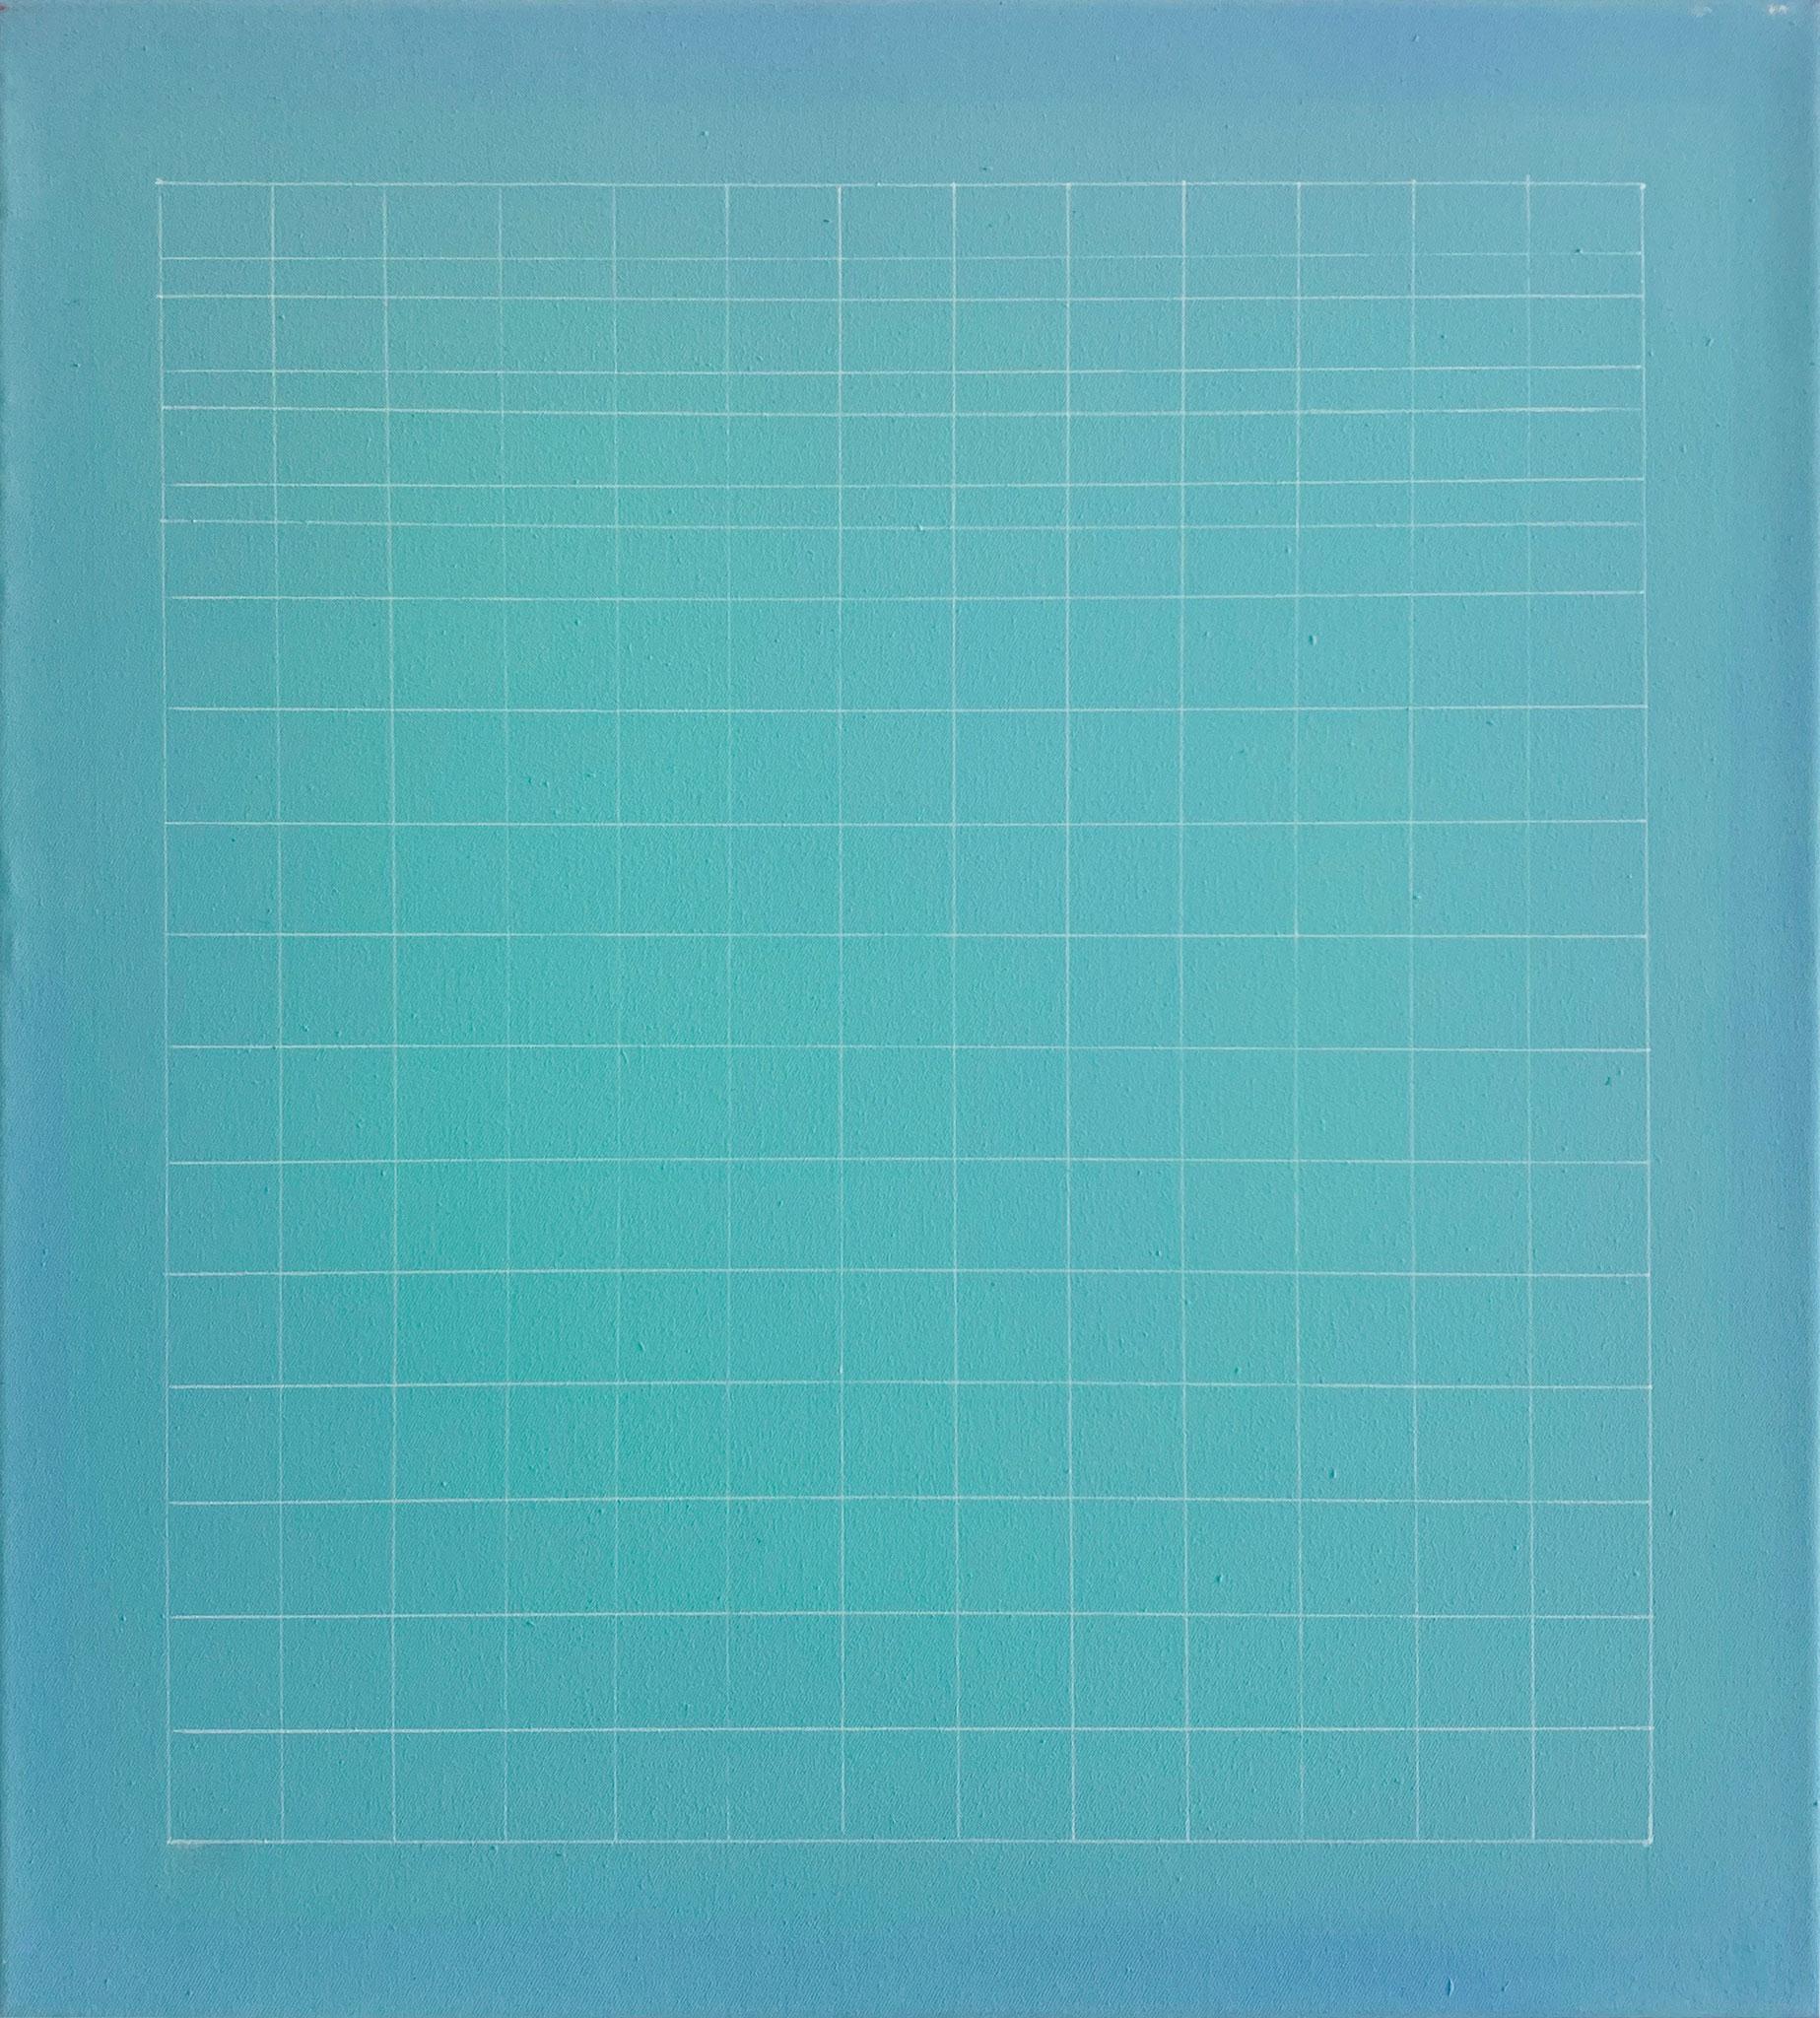 Daniel Hörner, O.T., Öl auf Leinwand 45 X 45 cm 2014